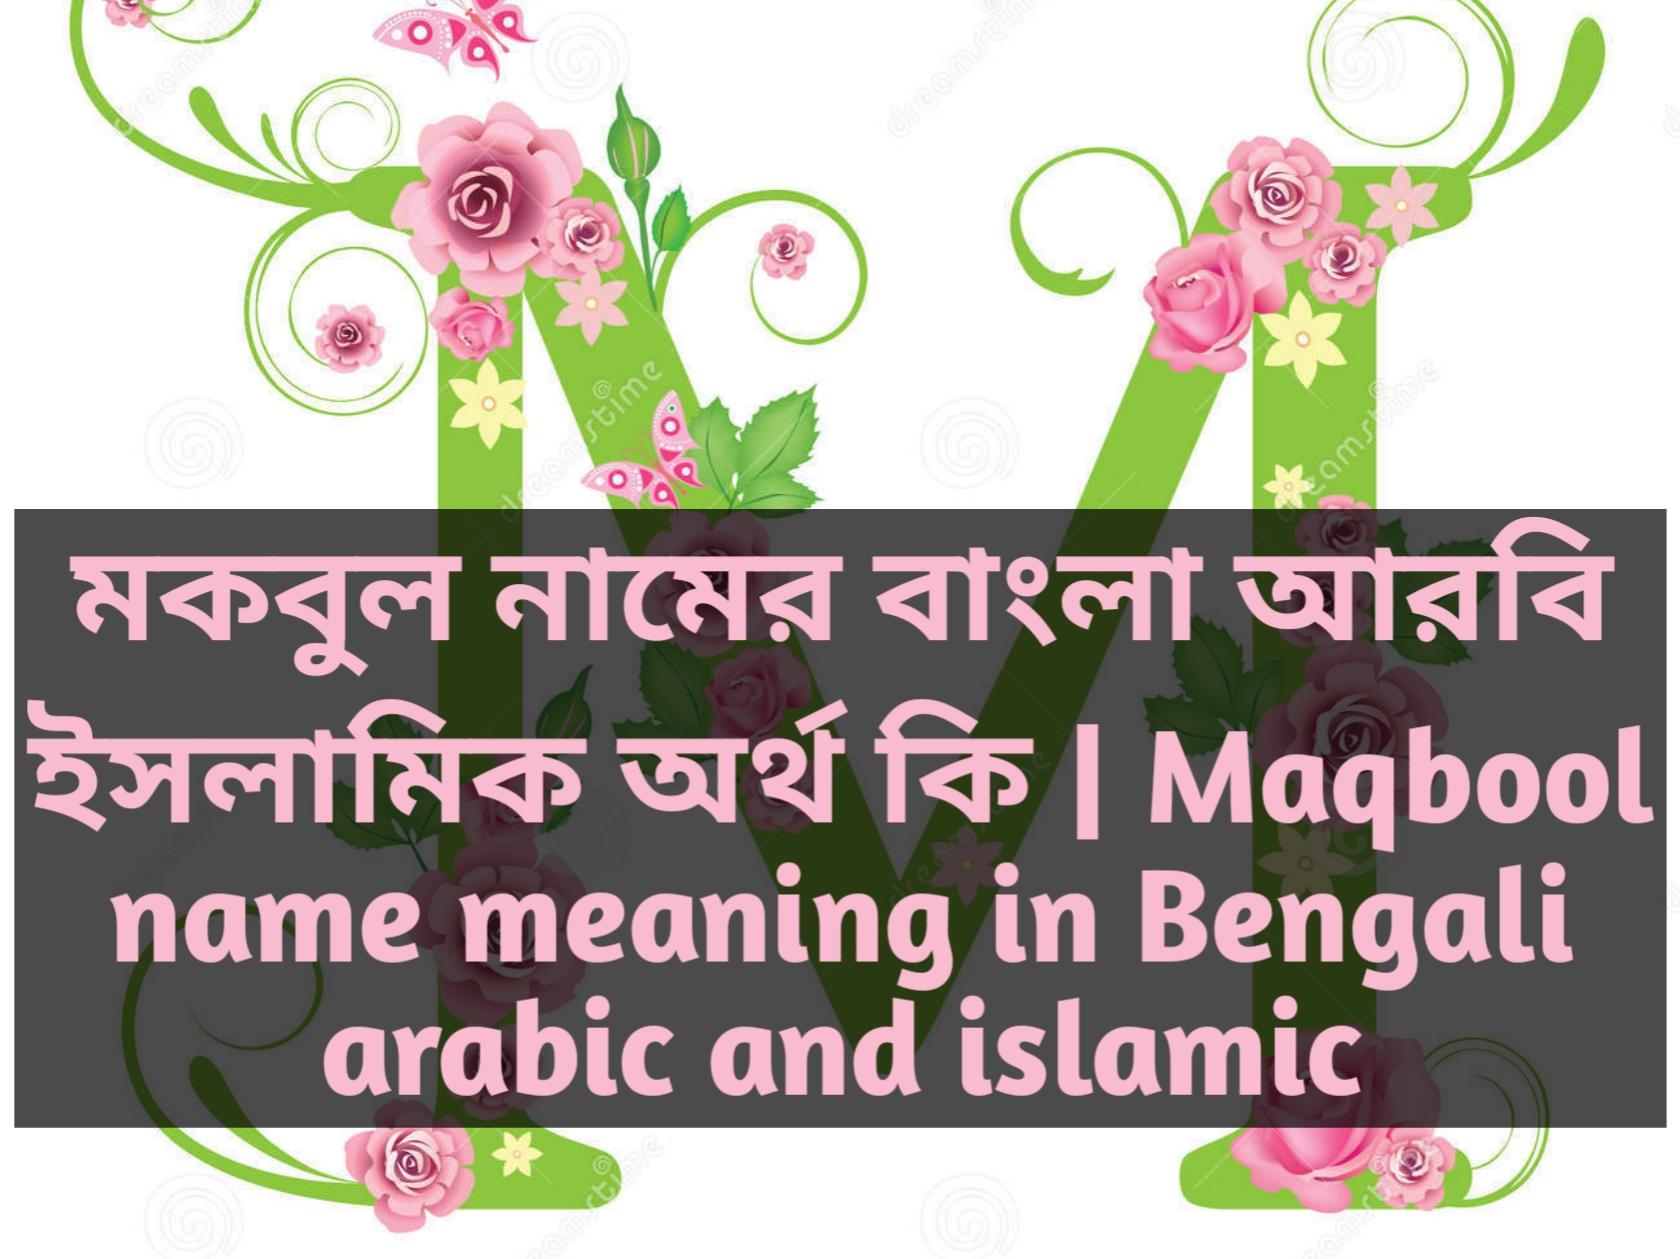 Maqbool name meaning in Bengali, মকবুল নামের অর্থ কি, মকবুল নামের বাংলা অর্থ কি, মকবুল নামের ইসলামিক অর্থ কি,